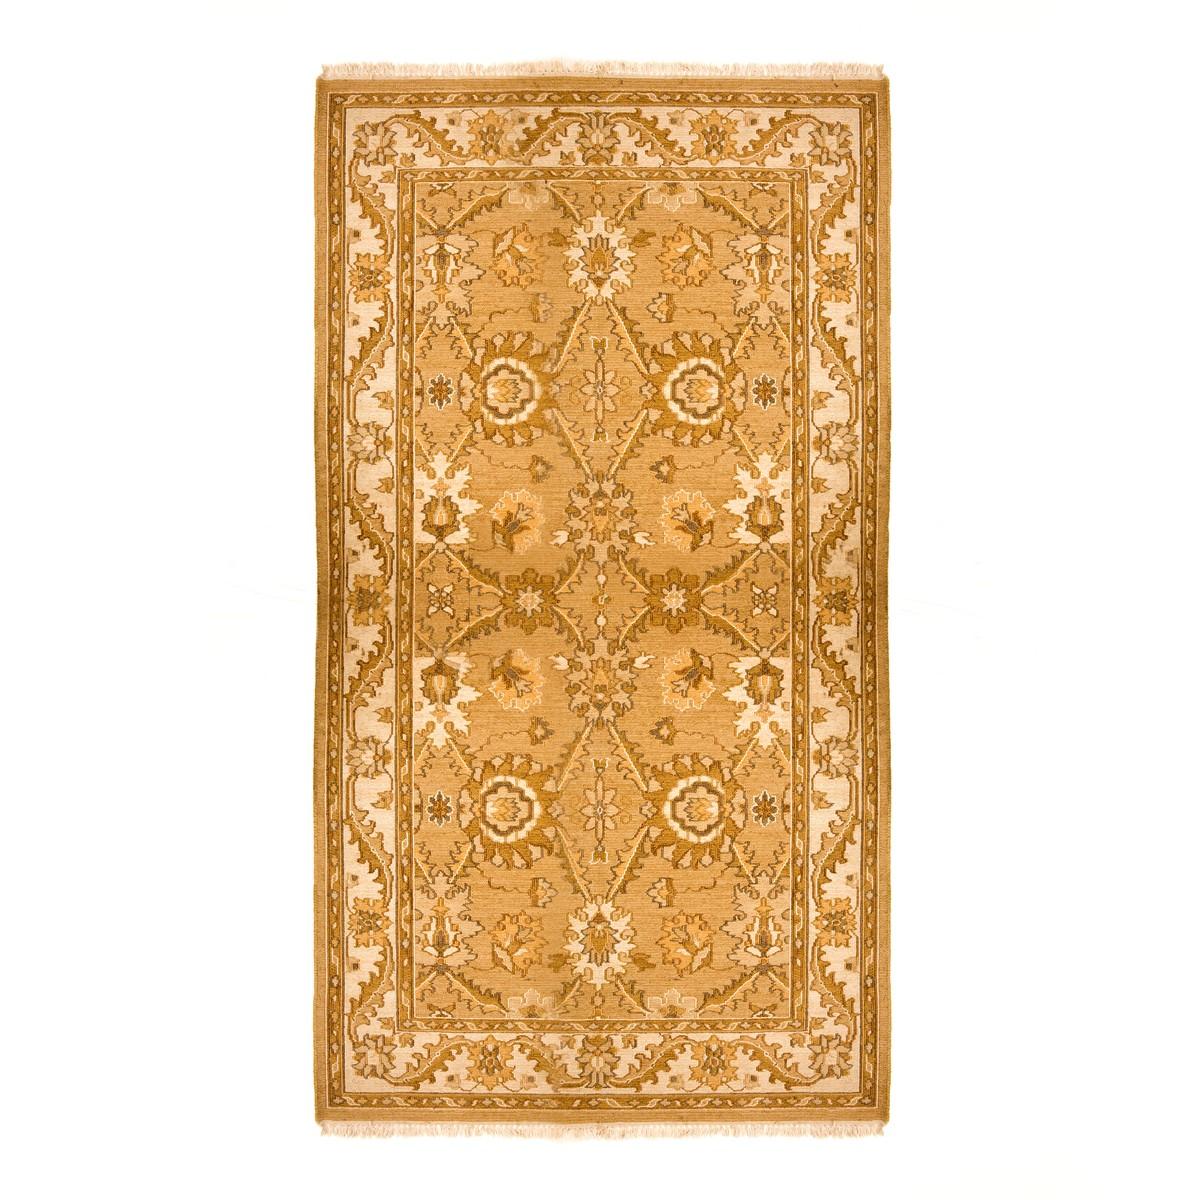 tapis bengal sumak rectangulaire en laine 150x210cm. Black Bedroom Furniture Sets. Home Design Ideas